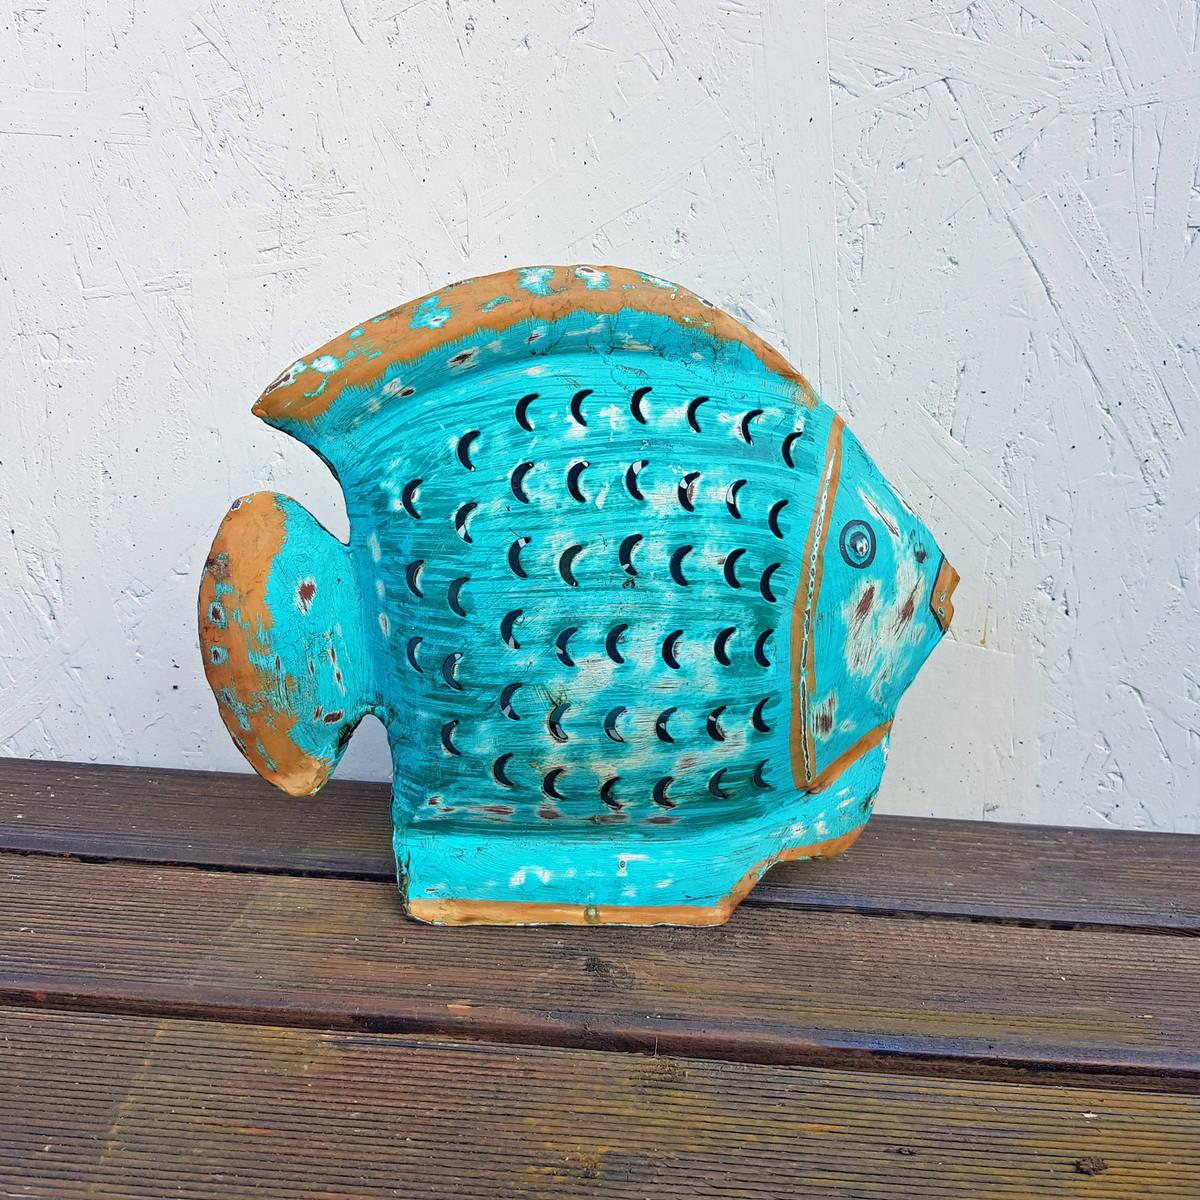 Fisch bunt bemalt aus Metall, zum Stellen, L. 31cm